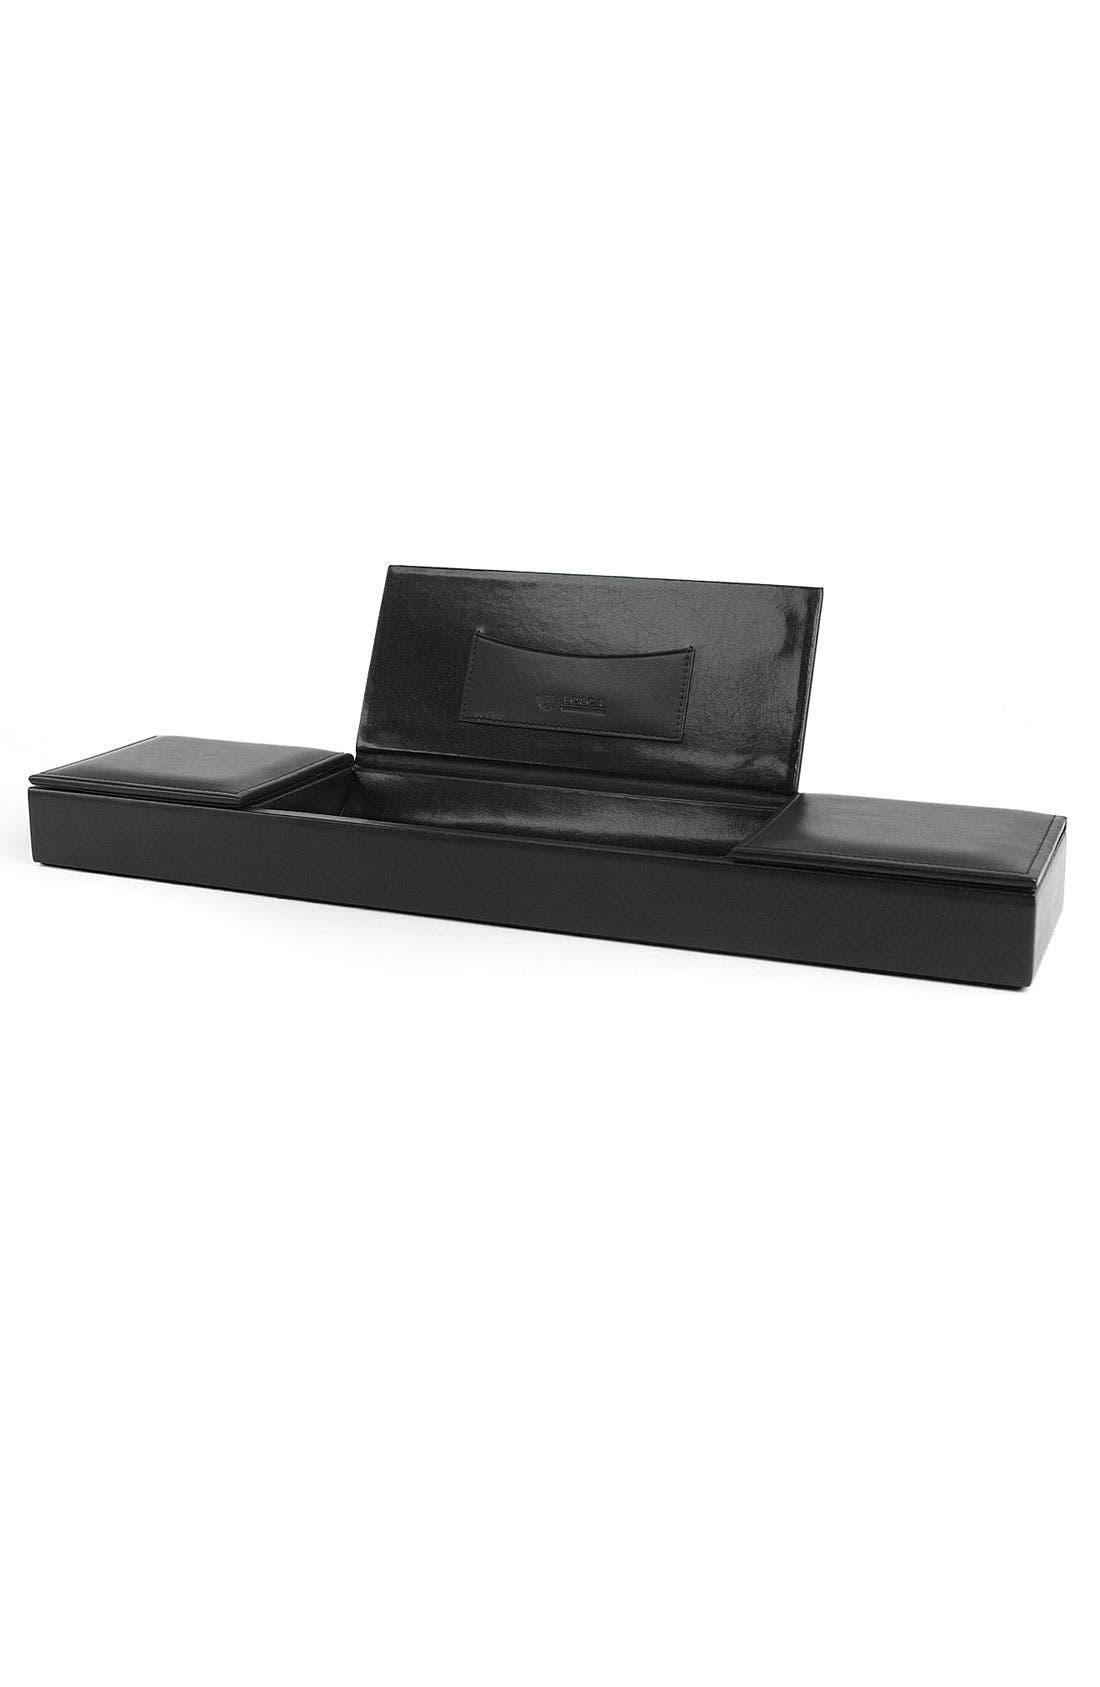 Alternate Image 1 Selected - Bosca 'Nappa Vitello Collection' Leather Desk Organizer